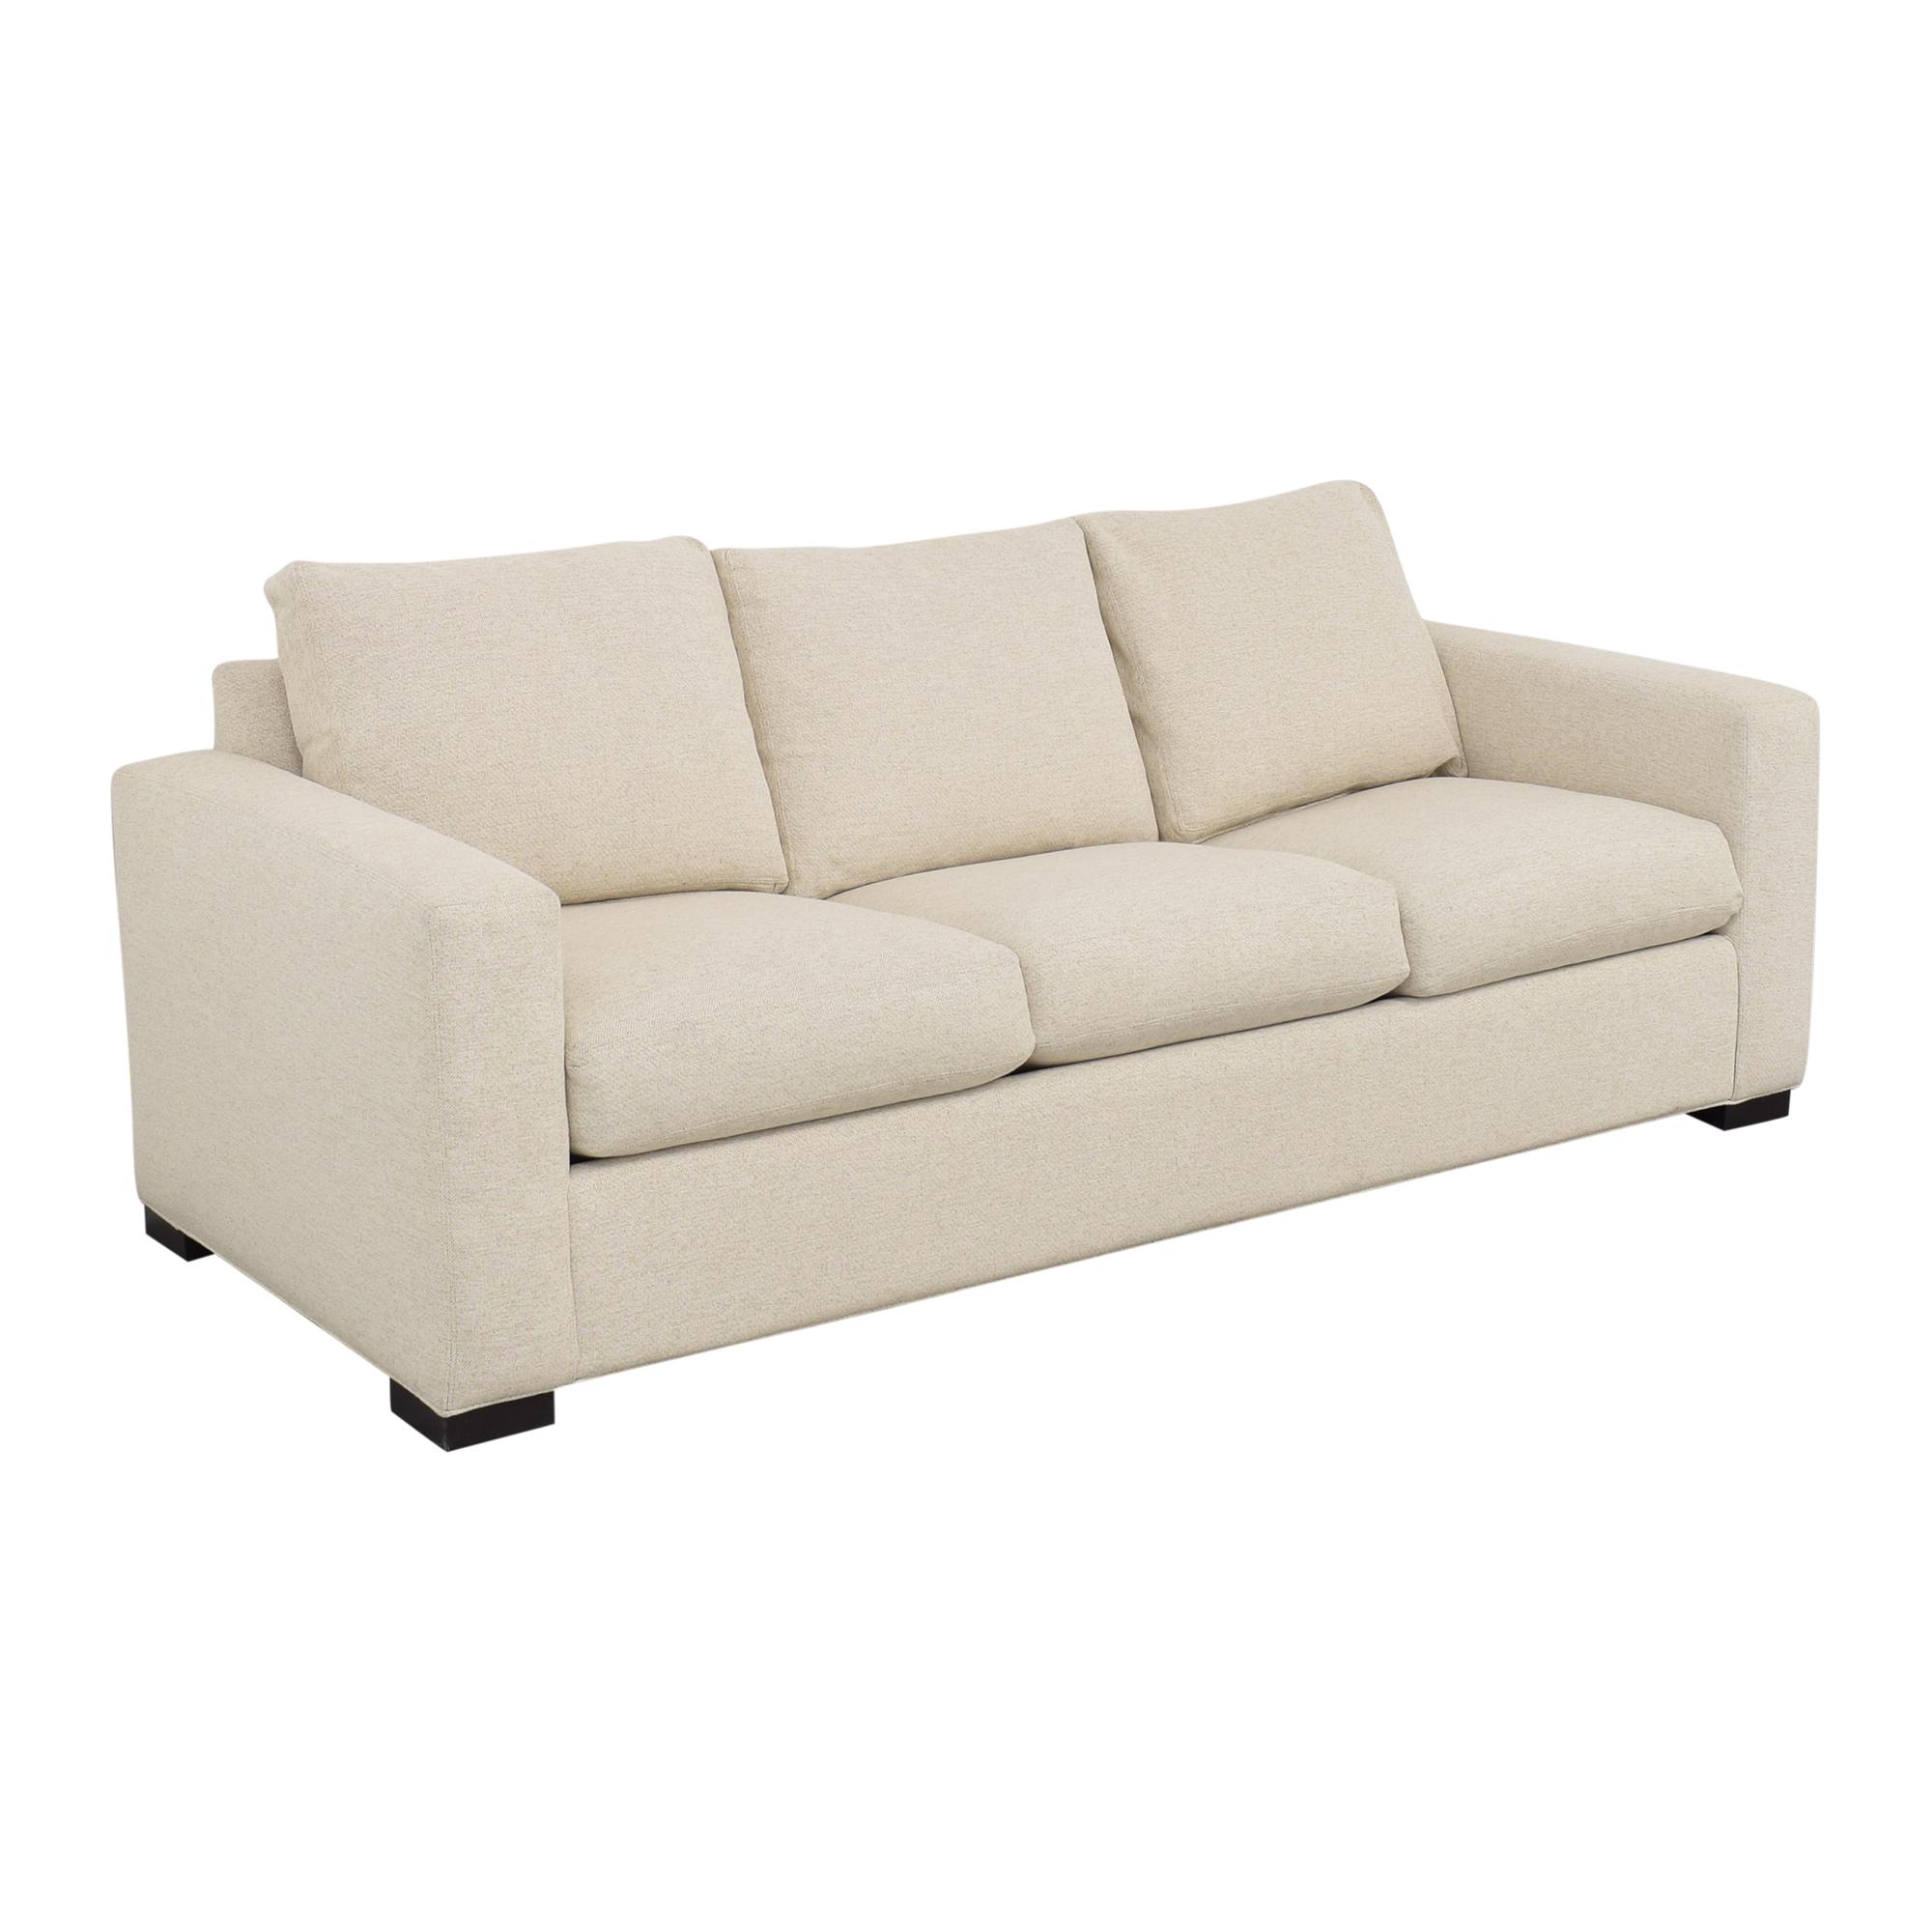 Room & Board Room & Board Queen Sleeper Sofa with Ottoman coupon